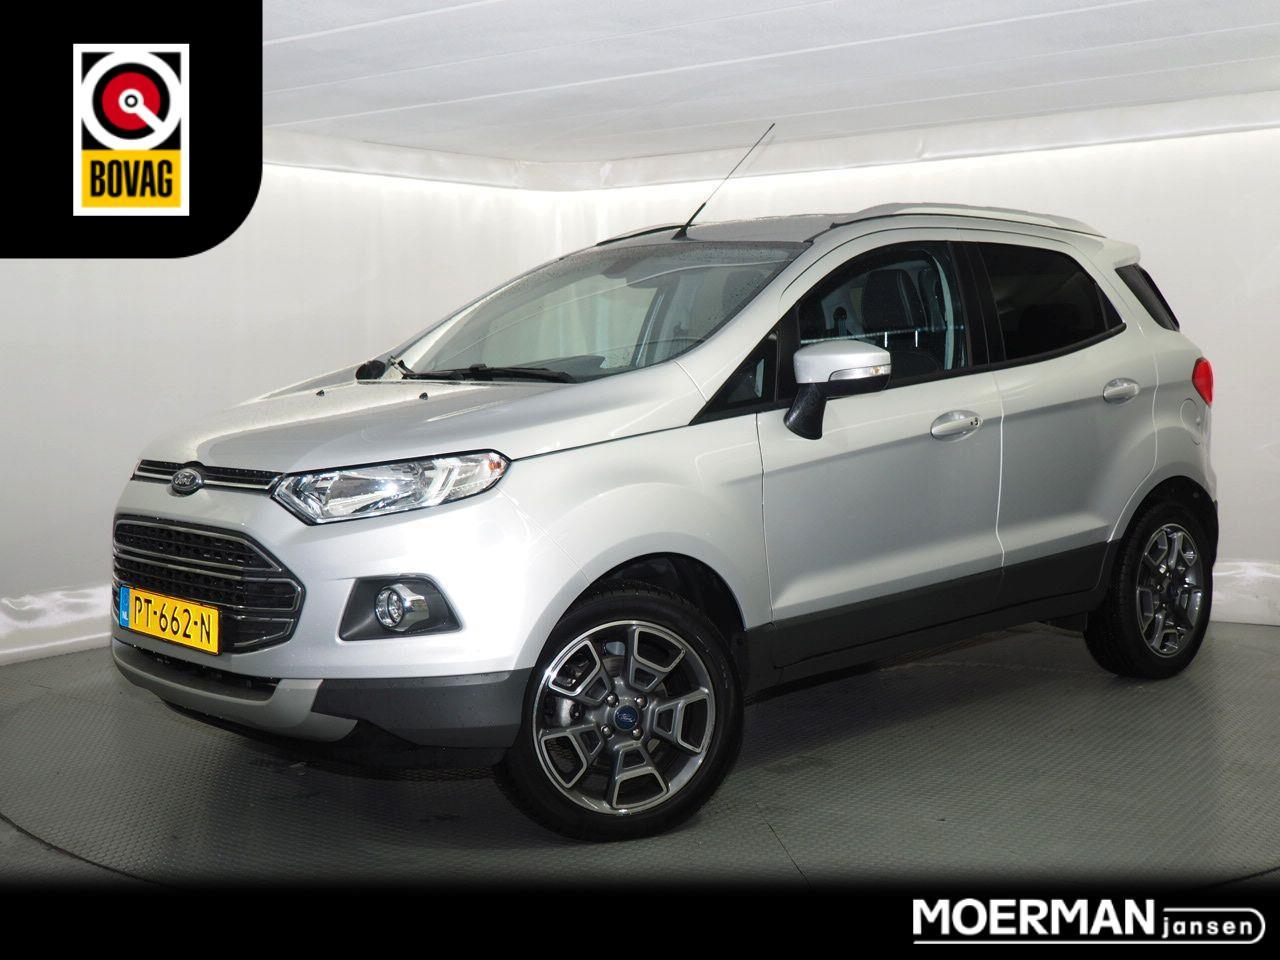 Ford Ecosport 1.5 ti-vct titanium automaat / navigatie / 1e eig / climate & cruise control / 20.000km